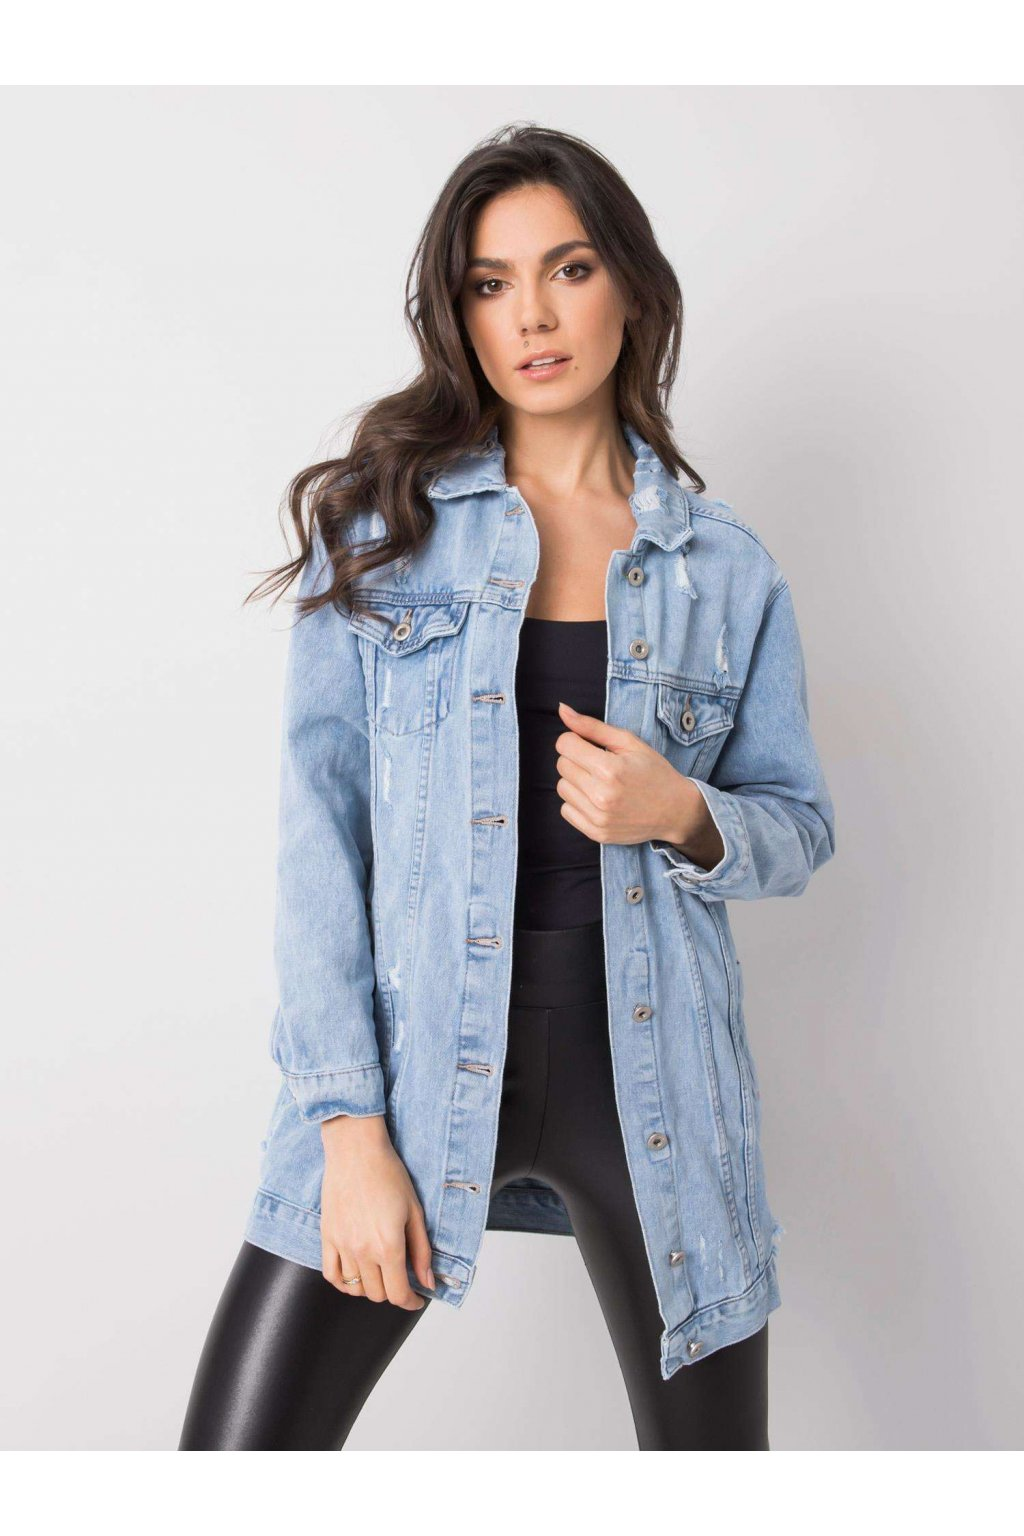 pol pl Niebieska damska kurtka jeansowa Ana 361489 4